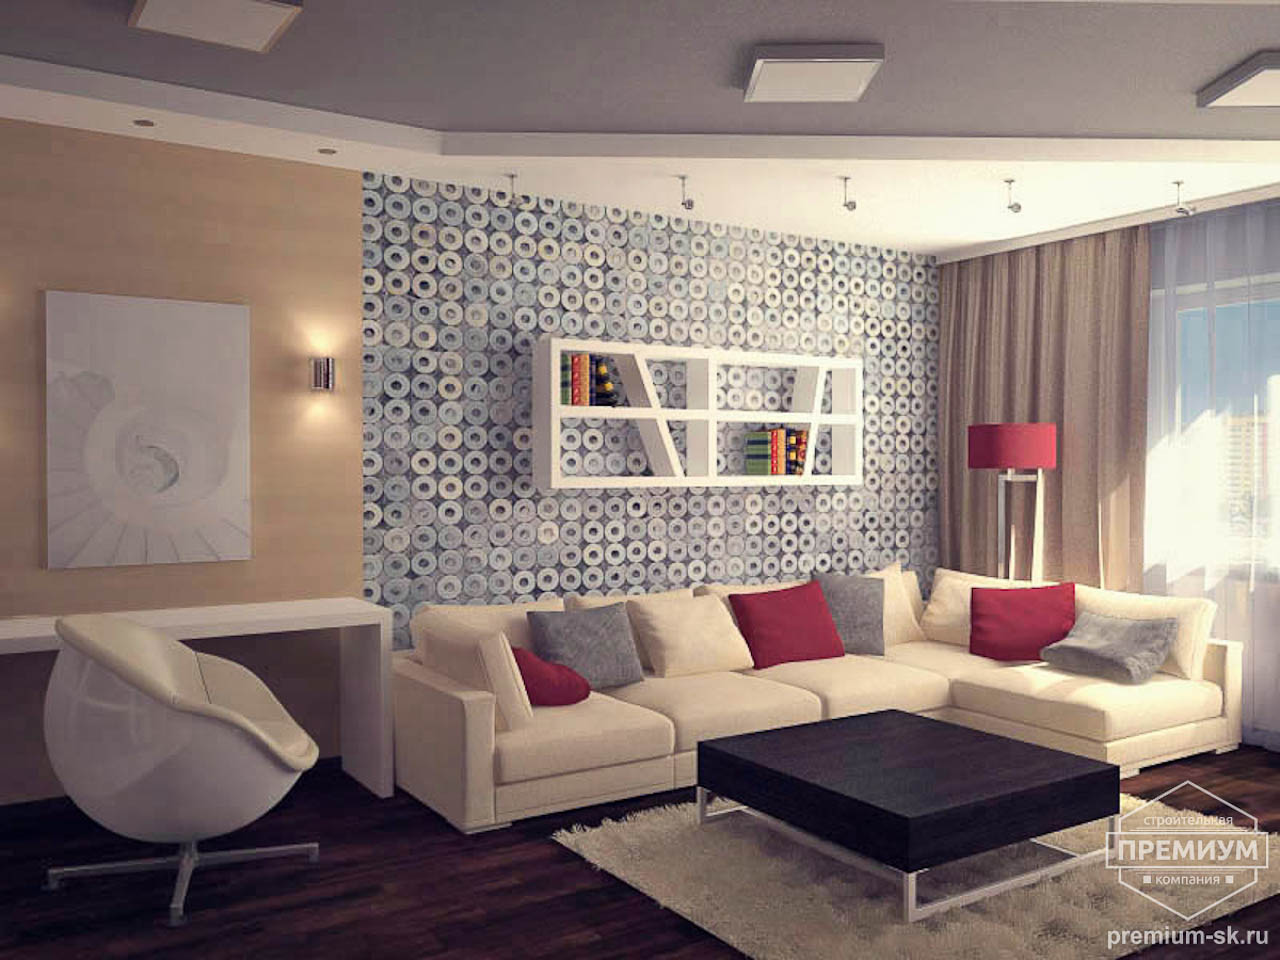 Дизайн интерьера однокомнатной квартиры по ул. Сыромолотова 11 img1846720107